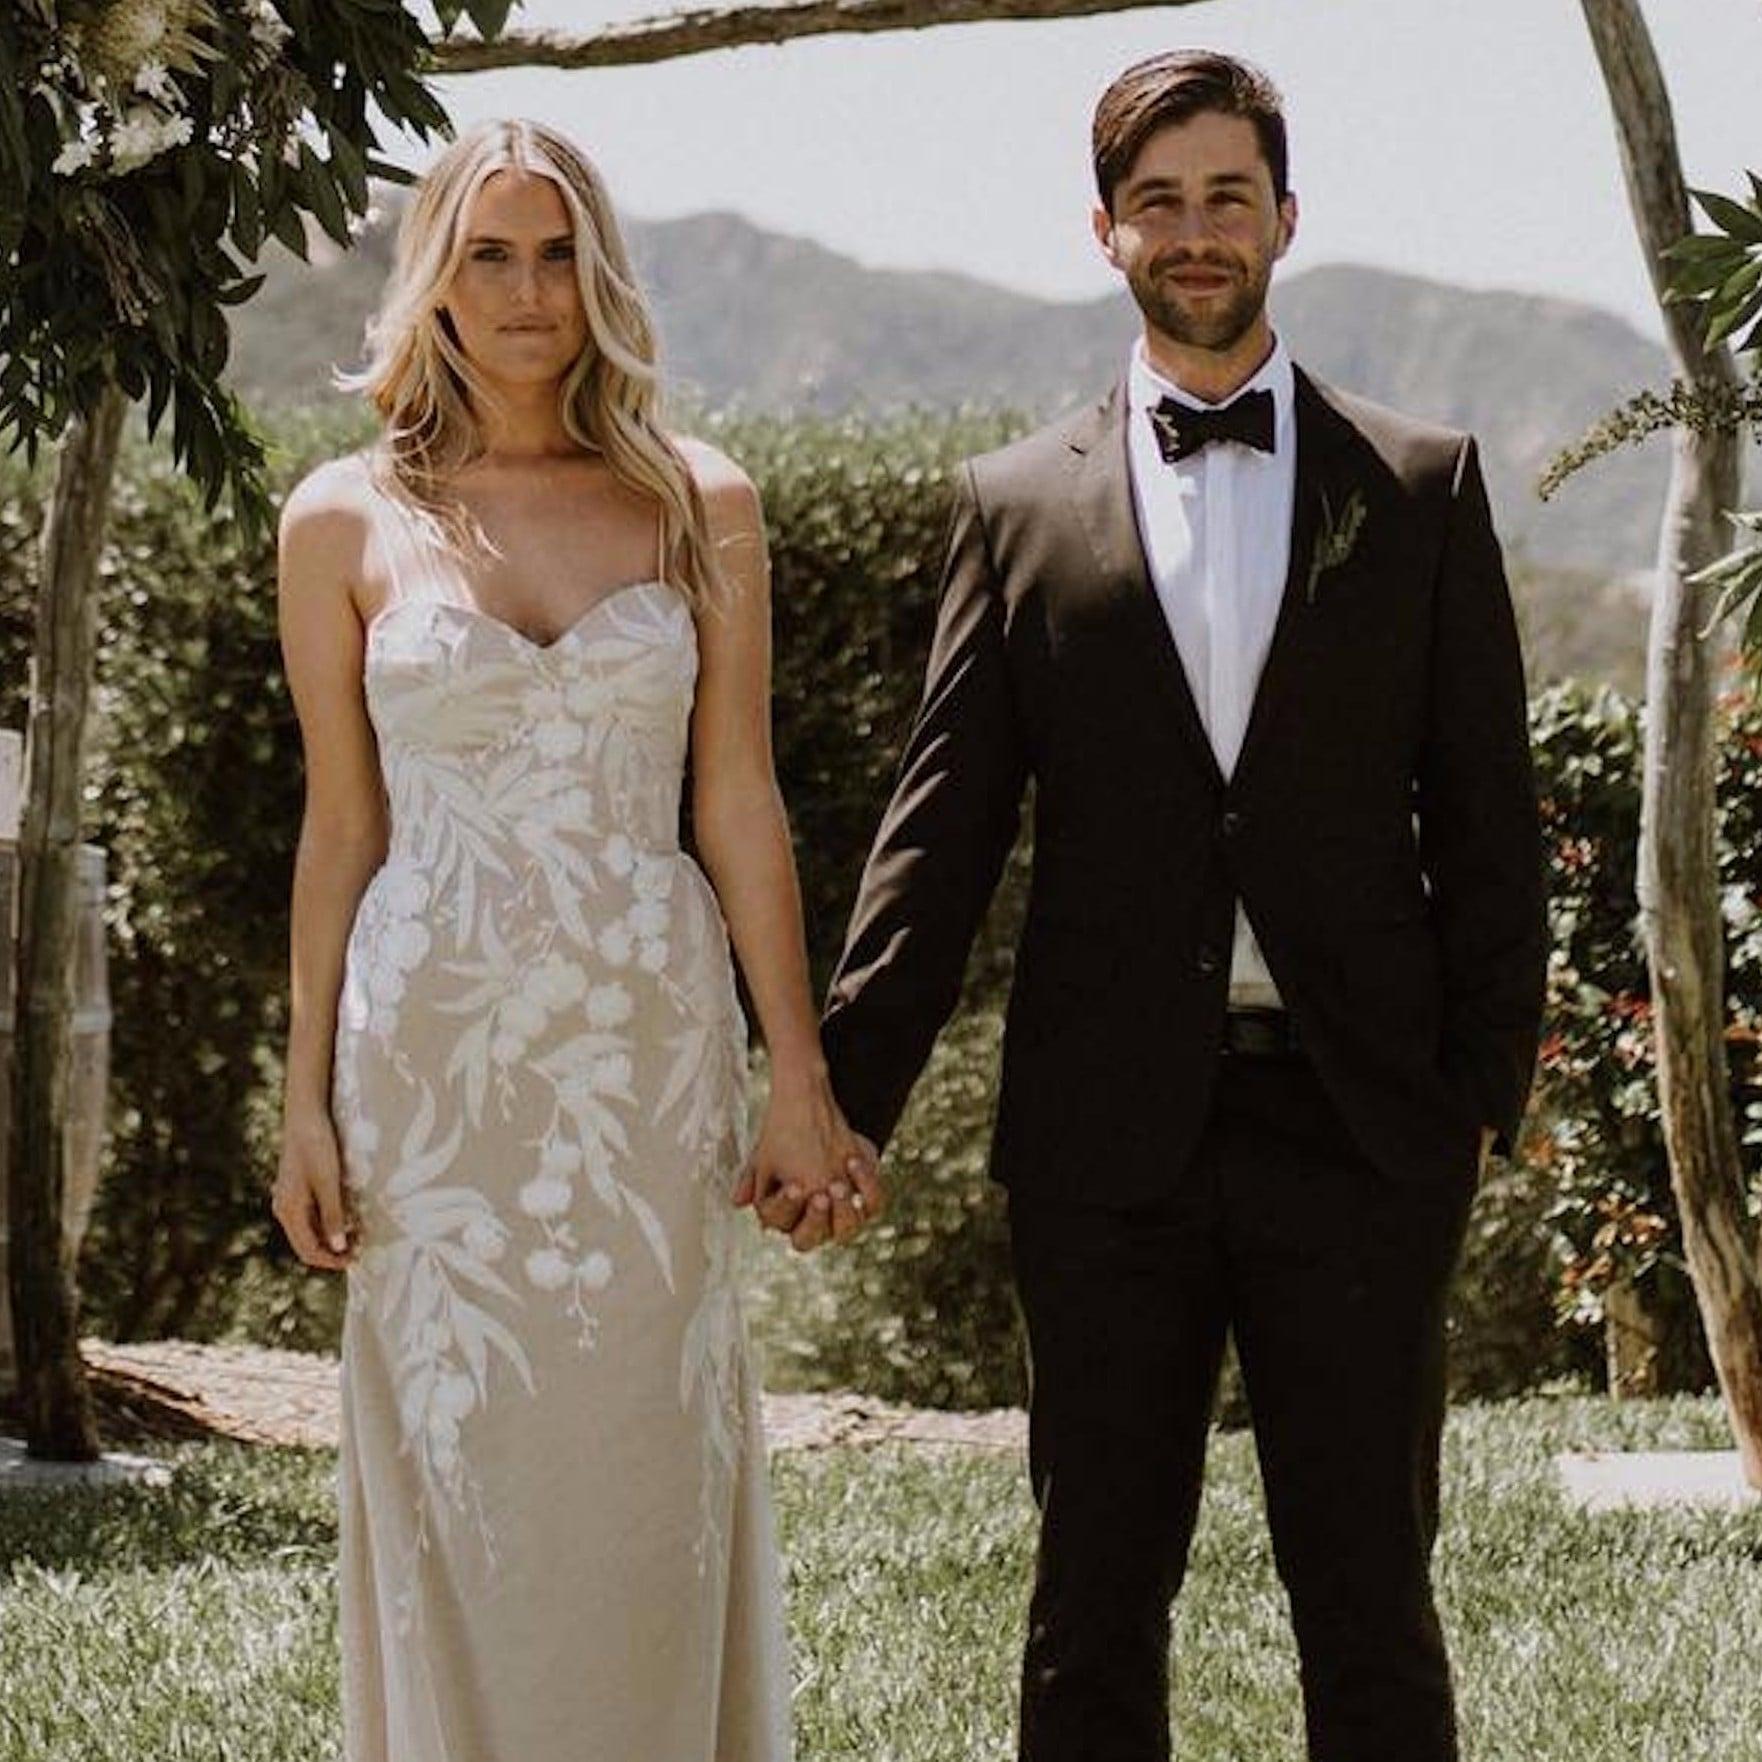 Josh Peck's wife